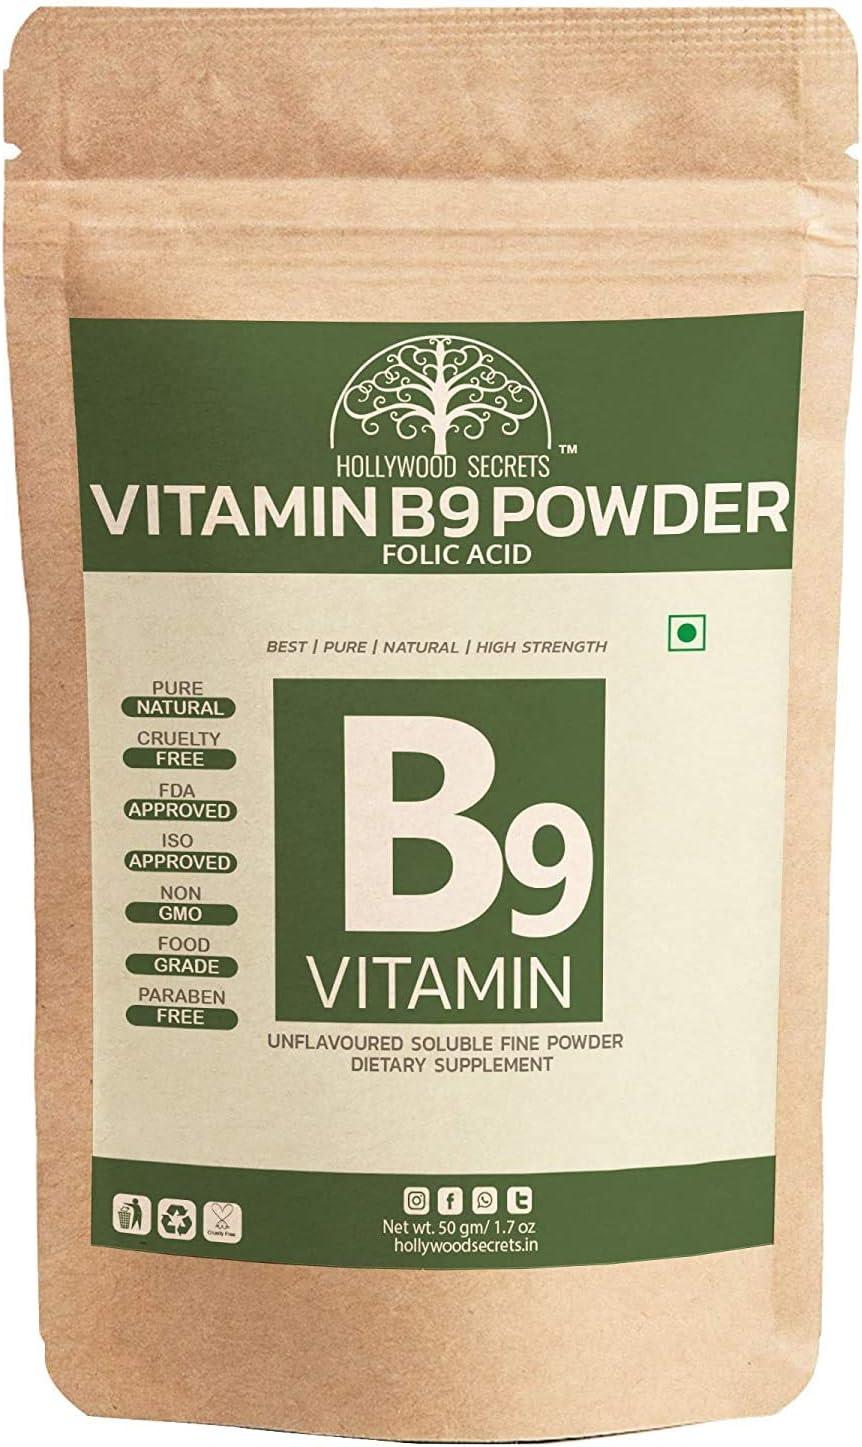 DD Store Hollywood Japan's largest assortment Secrets Vitamin Acid Powder 50gm B9 2021 new Folic